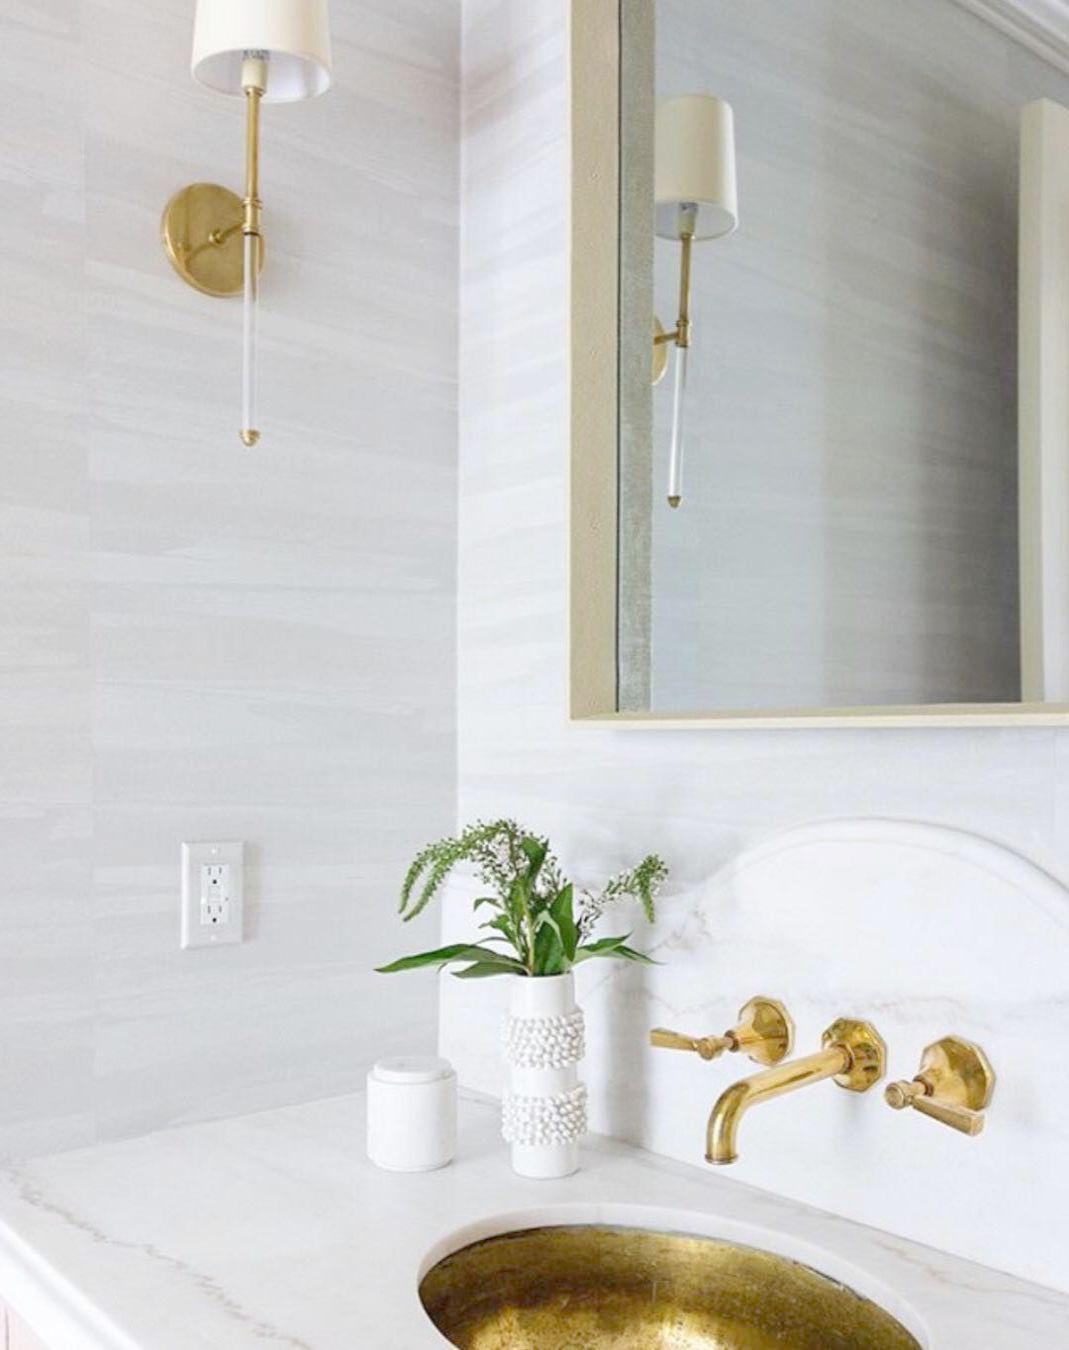 Luxury Bathroom Accessories Online India following Bathroom Decor ...